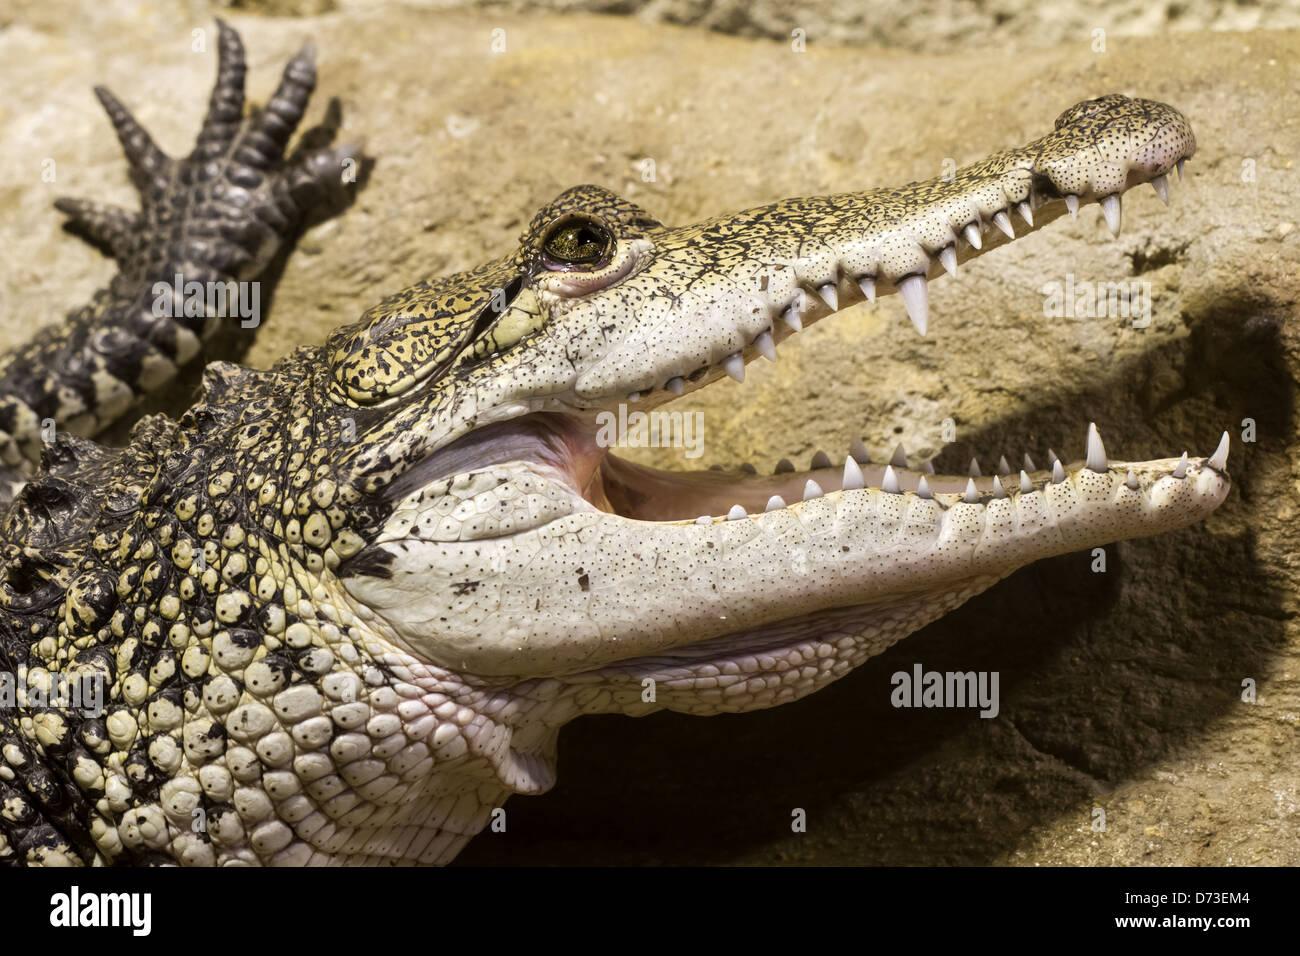 Morelet's crocodile - Tropical World, Leeds - Stock Image